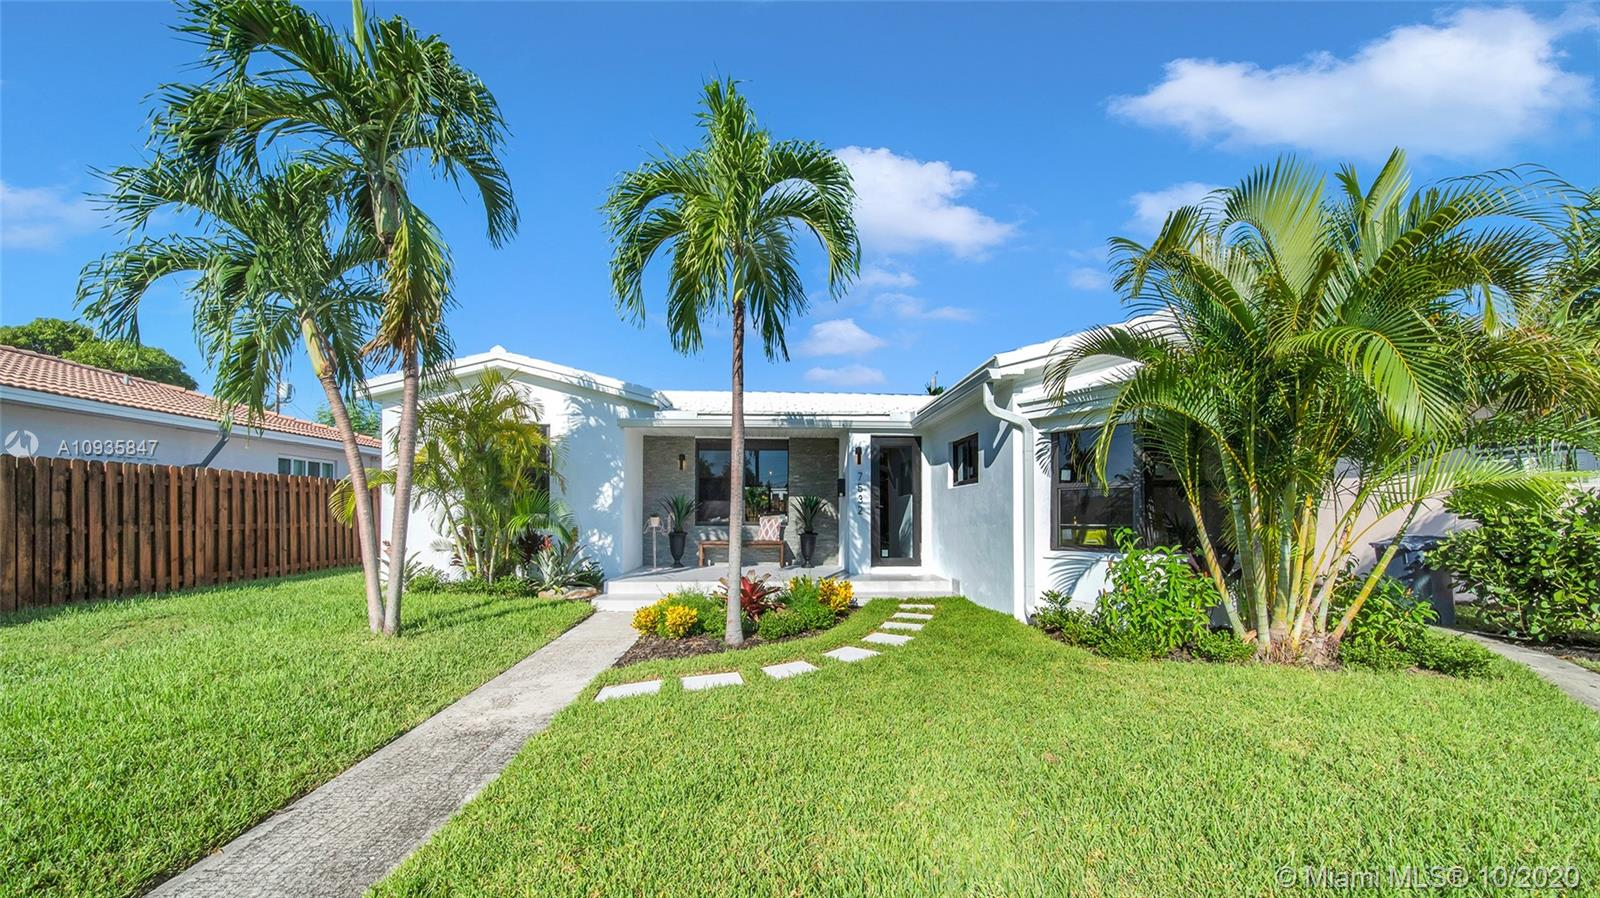 7532  Hispanola Ave  For Sale A10935847, FL